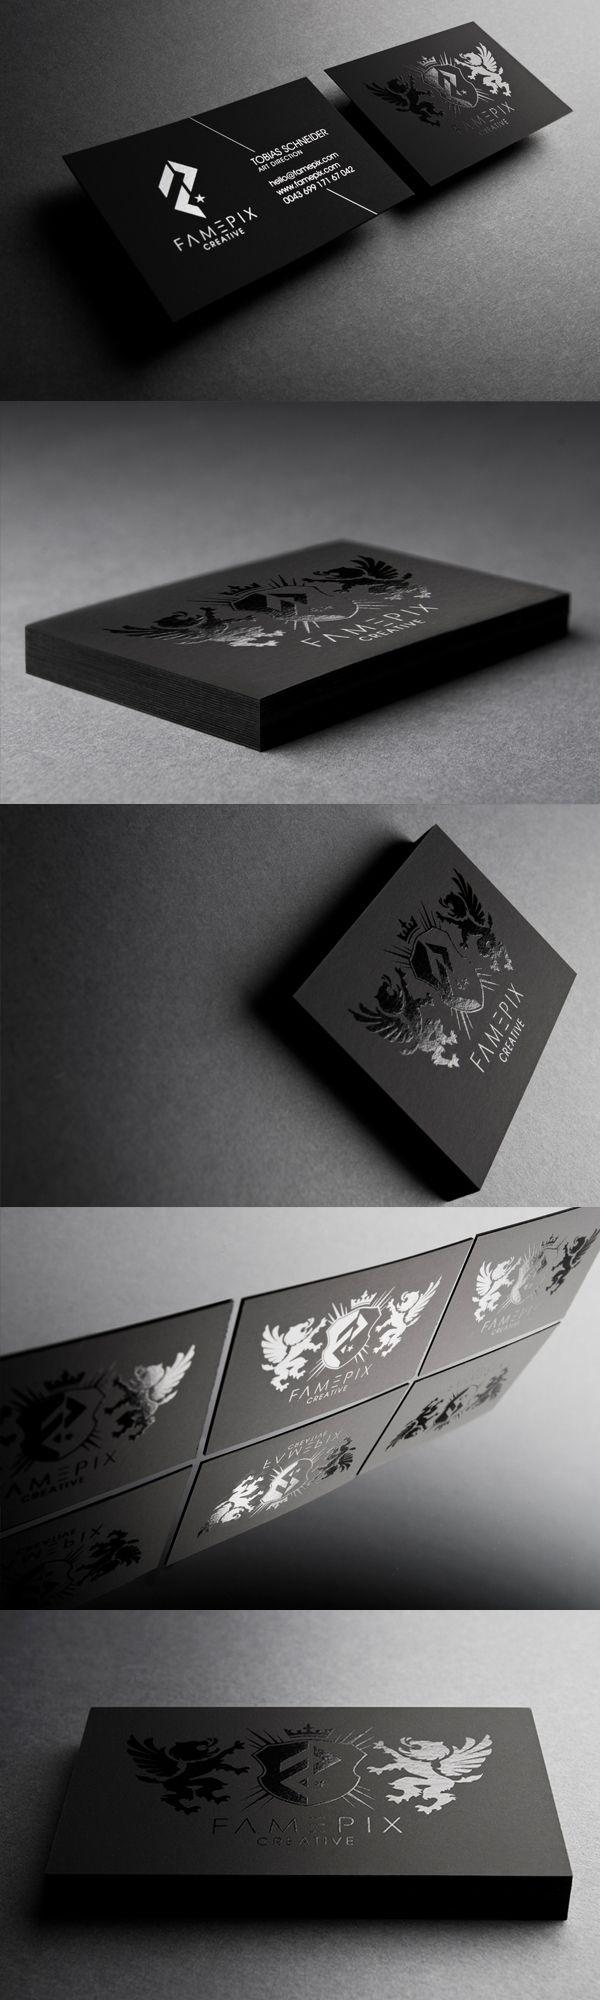 Black BusinessCards - Famepix - Business Cards - Creattica